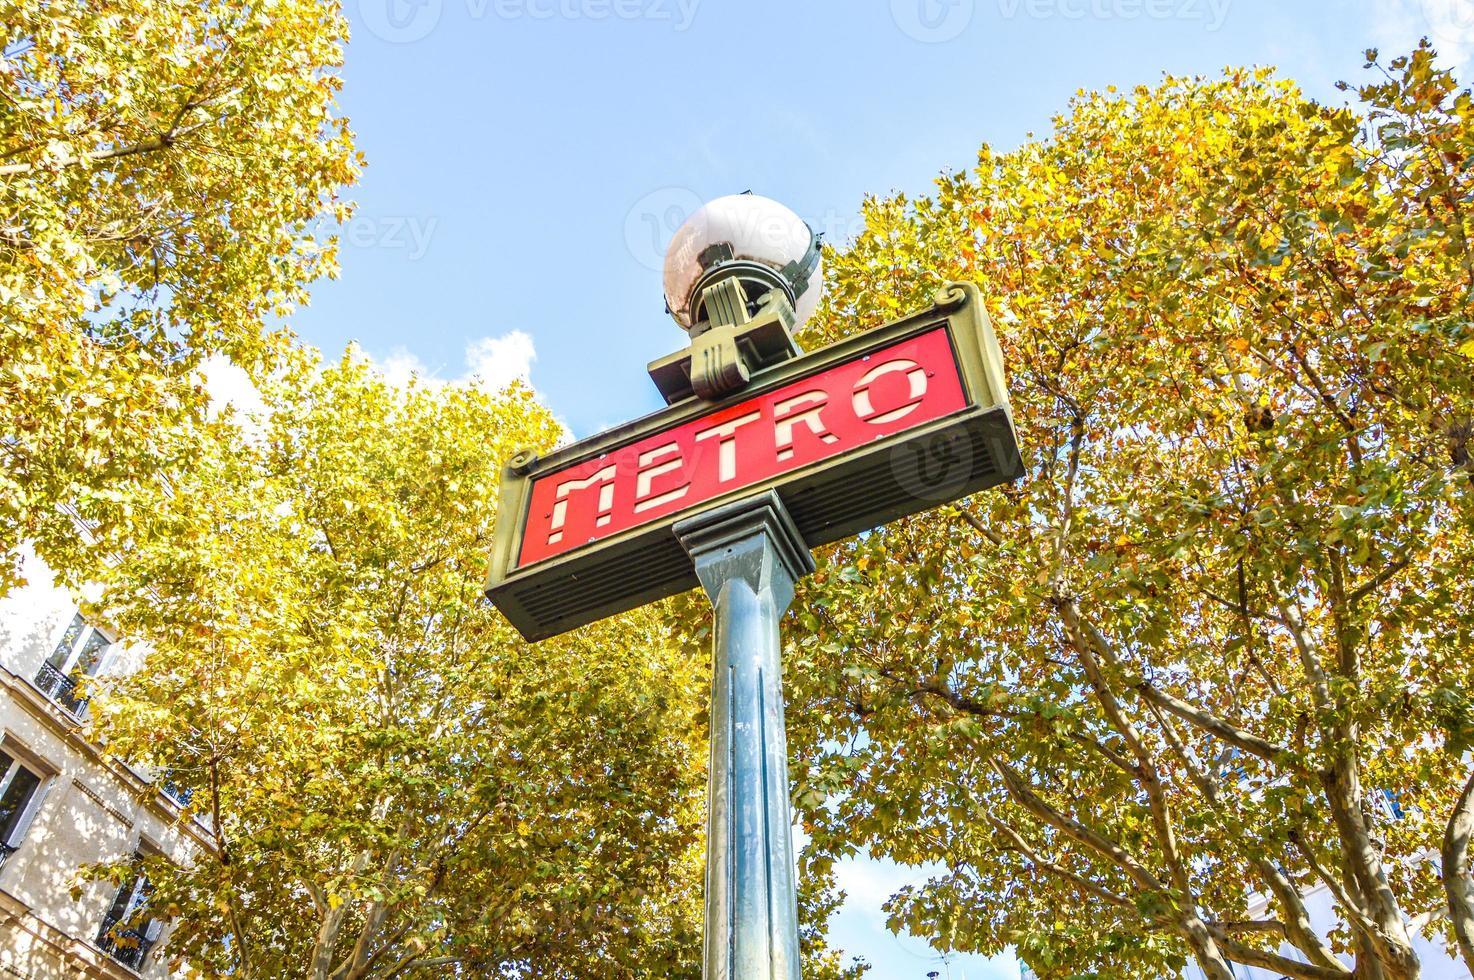 schöne U-Bahnstation in Paris foto